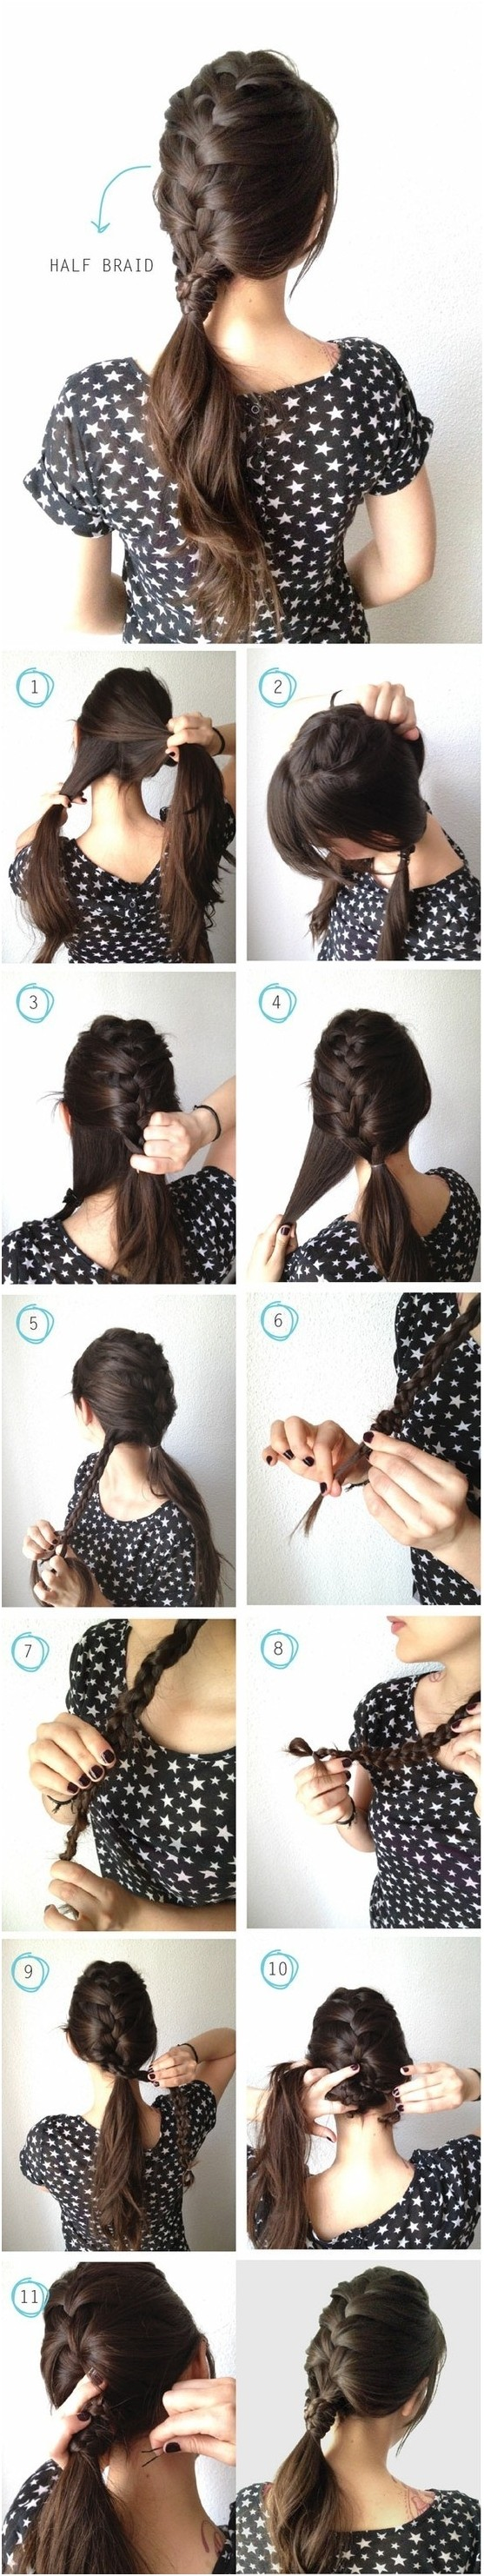 Swell Ponytail Braid Hairstyles Step By Braids Short Hairstyles Gunalazisus